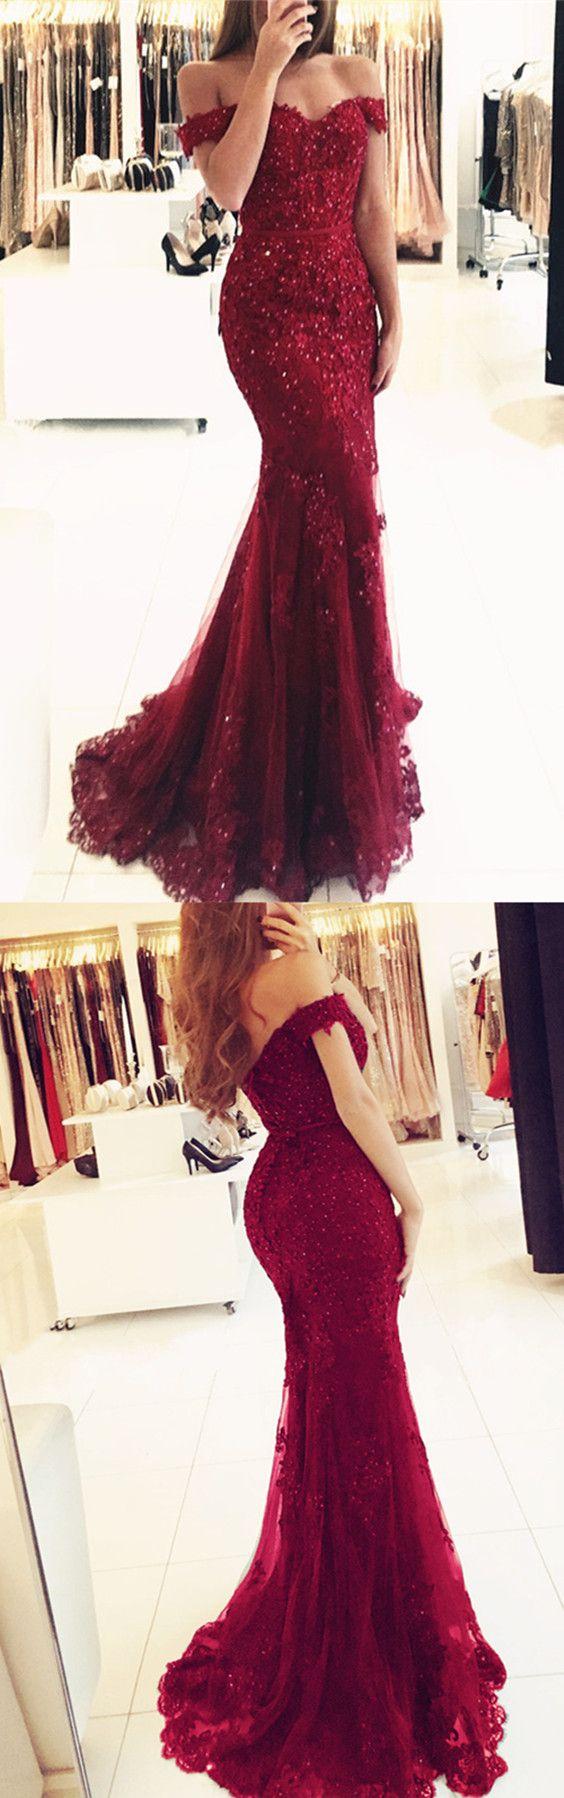 Off Shoulder Lace V-neck Mermaid Prom Dresses Burgundy Evening Gowns 2018